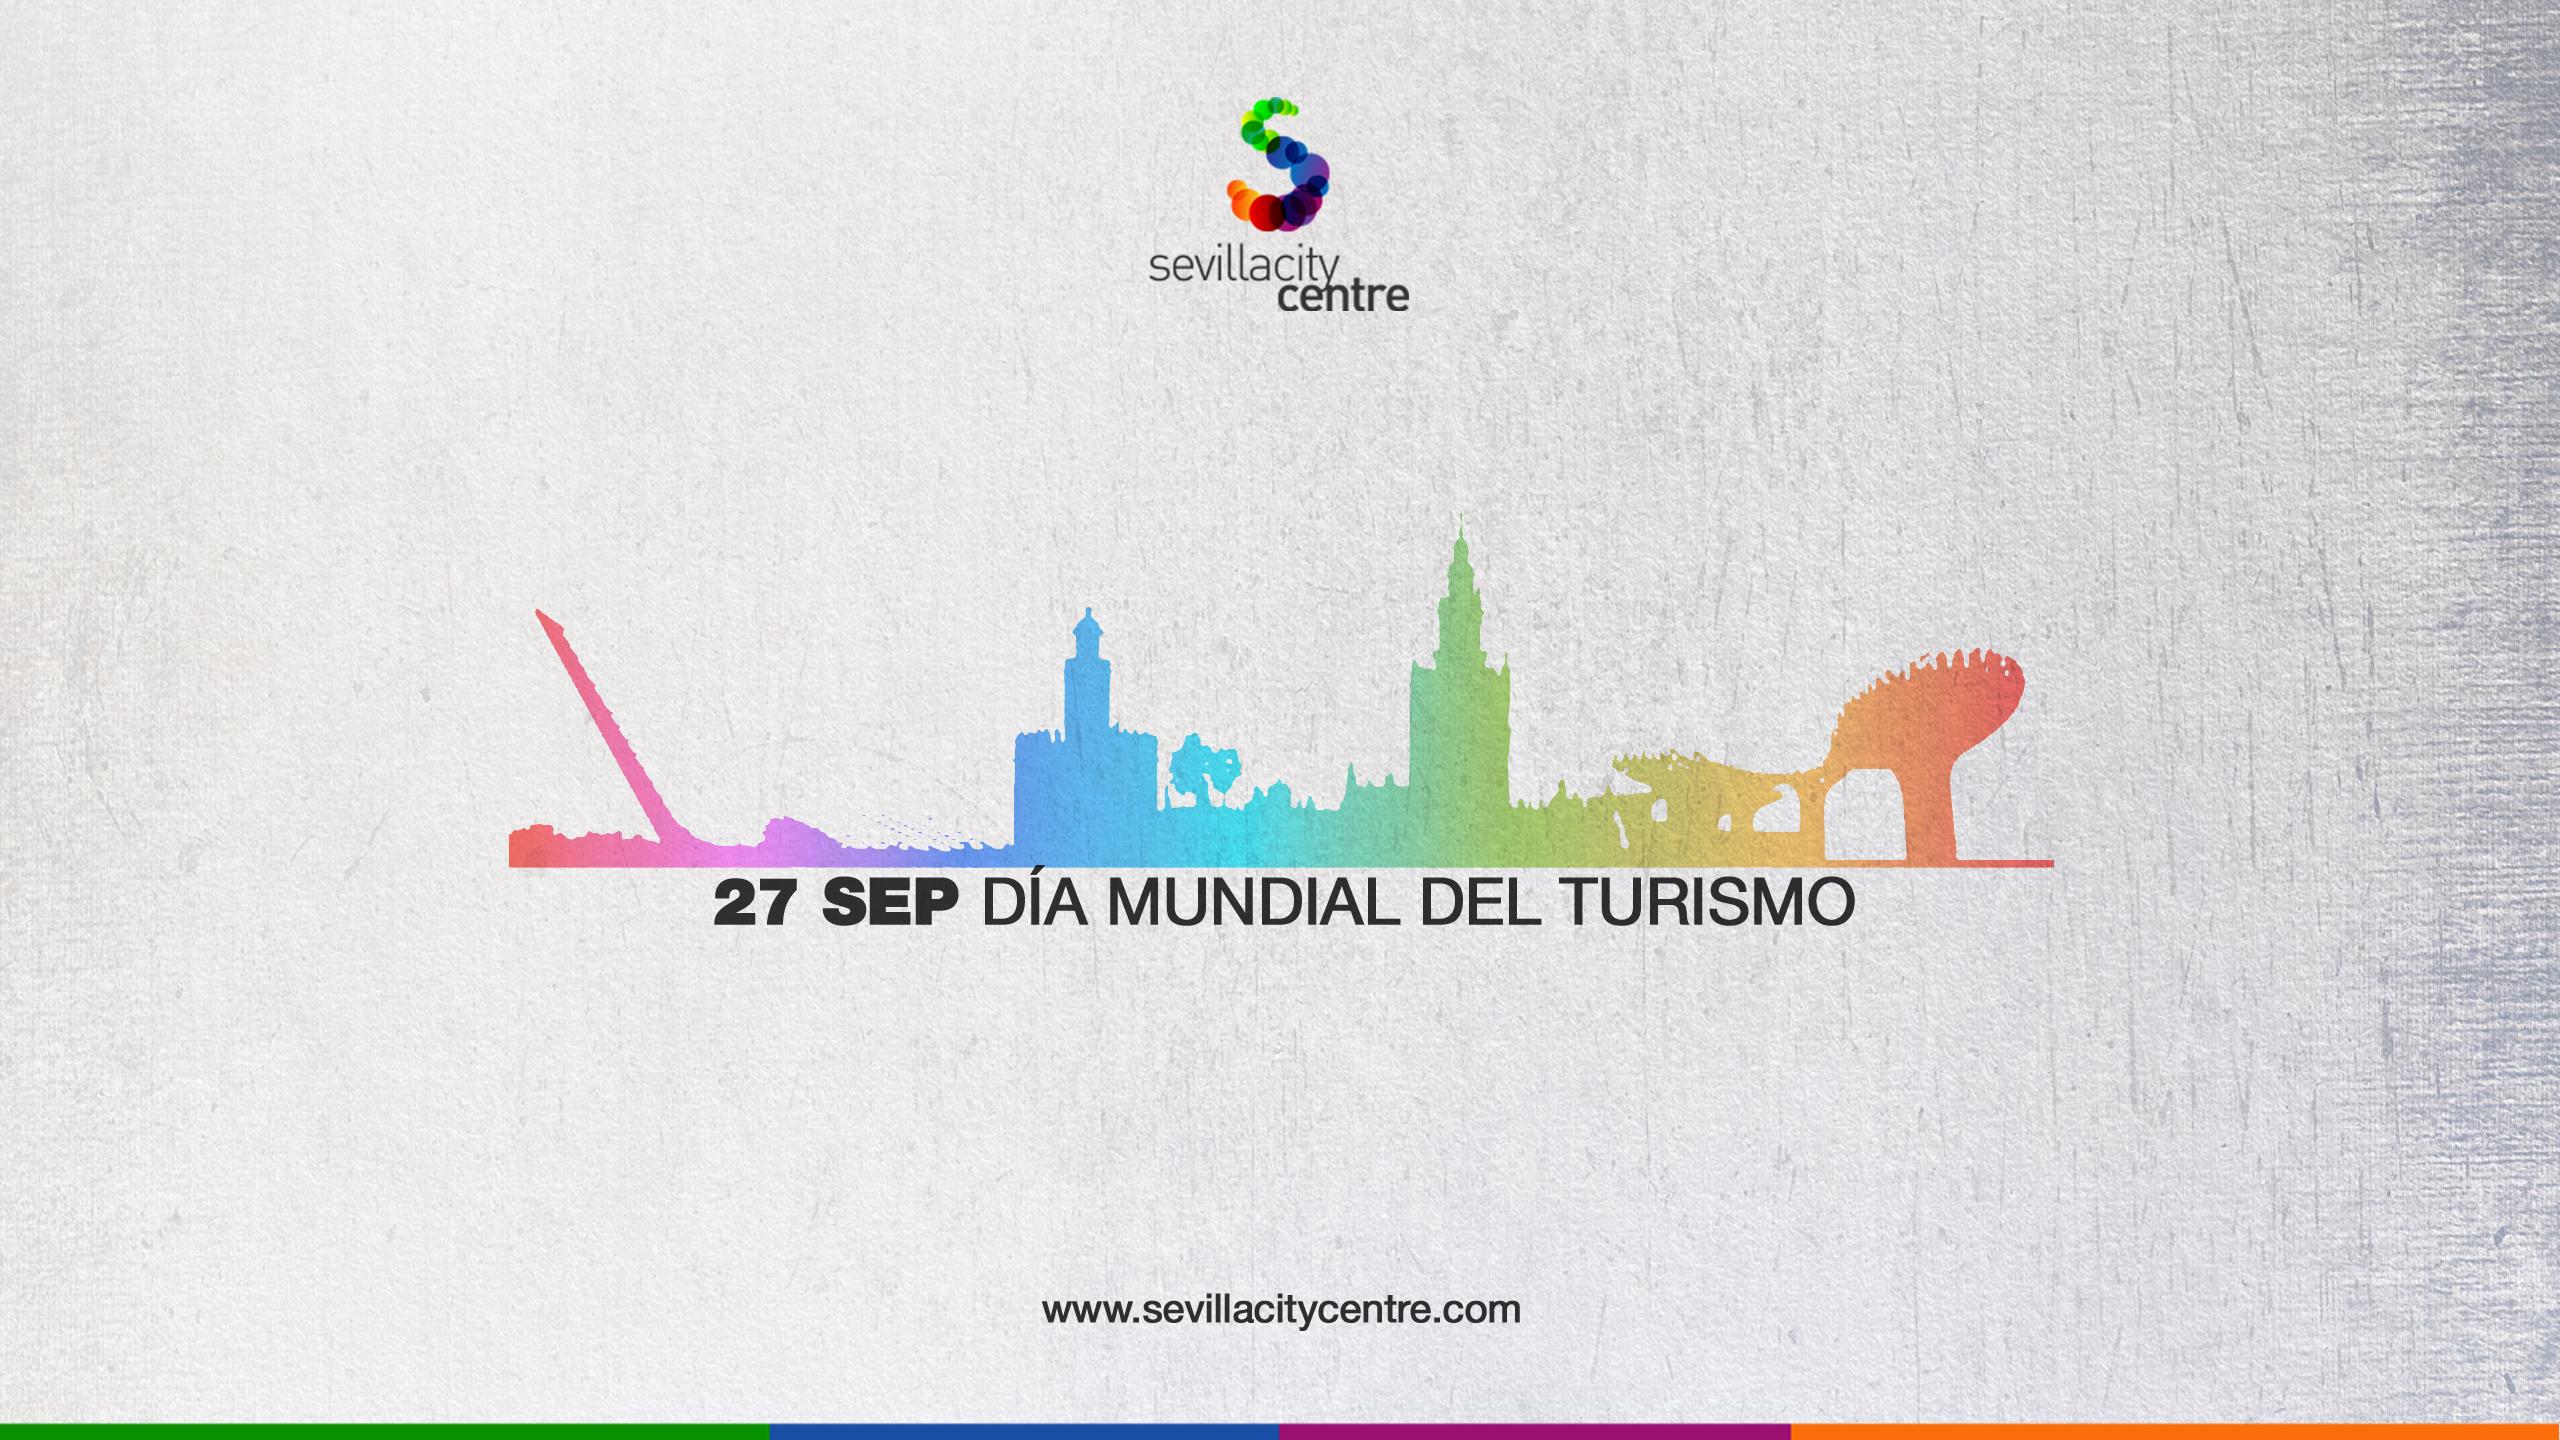 Dia Mundial del Turismo en Sevilla City Centre